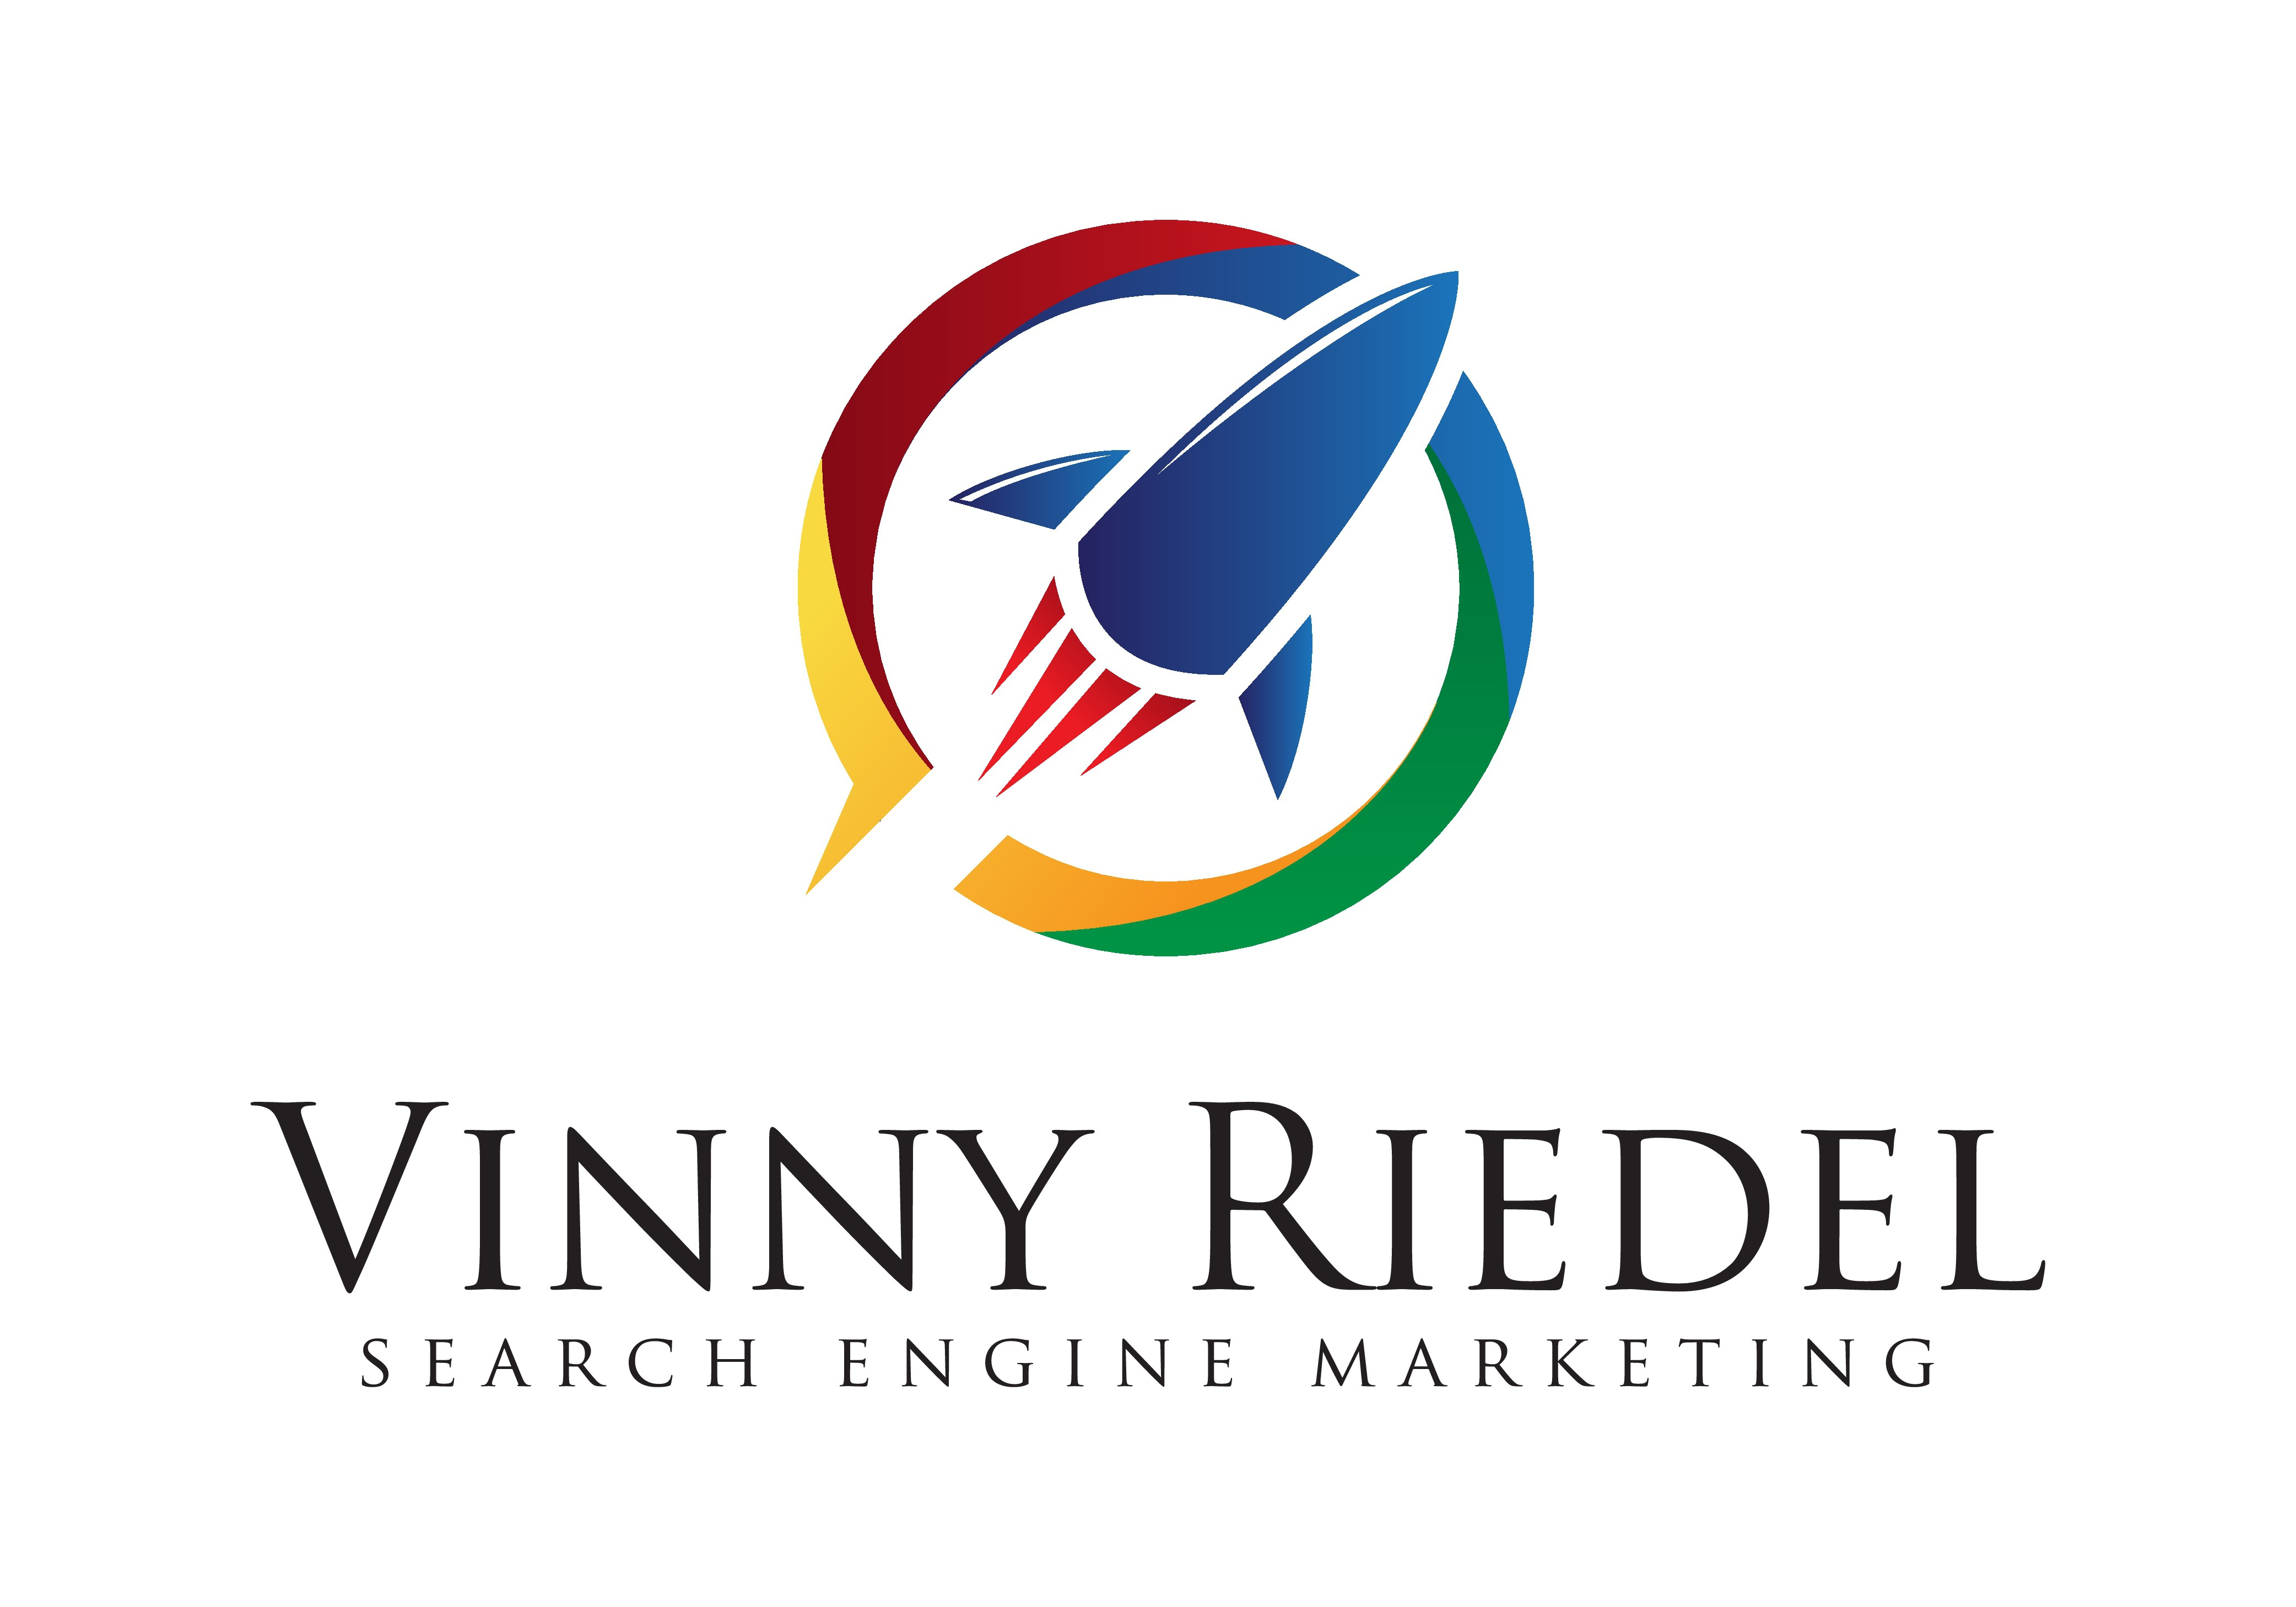 Create a logo for a future multi million dollar company! Search engine marketing!